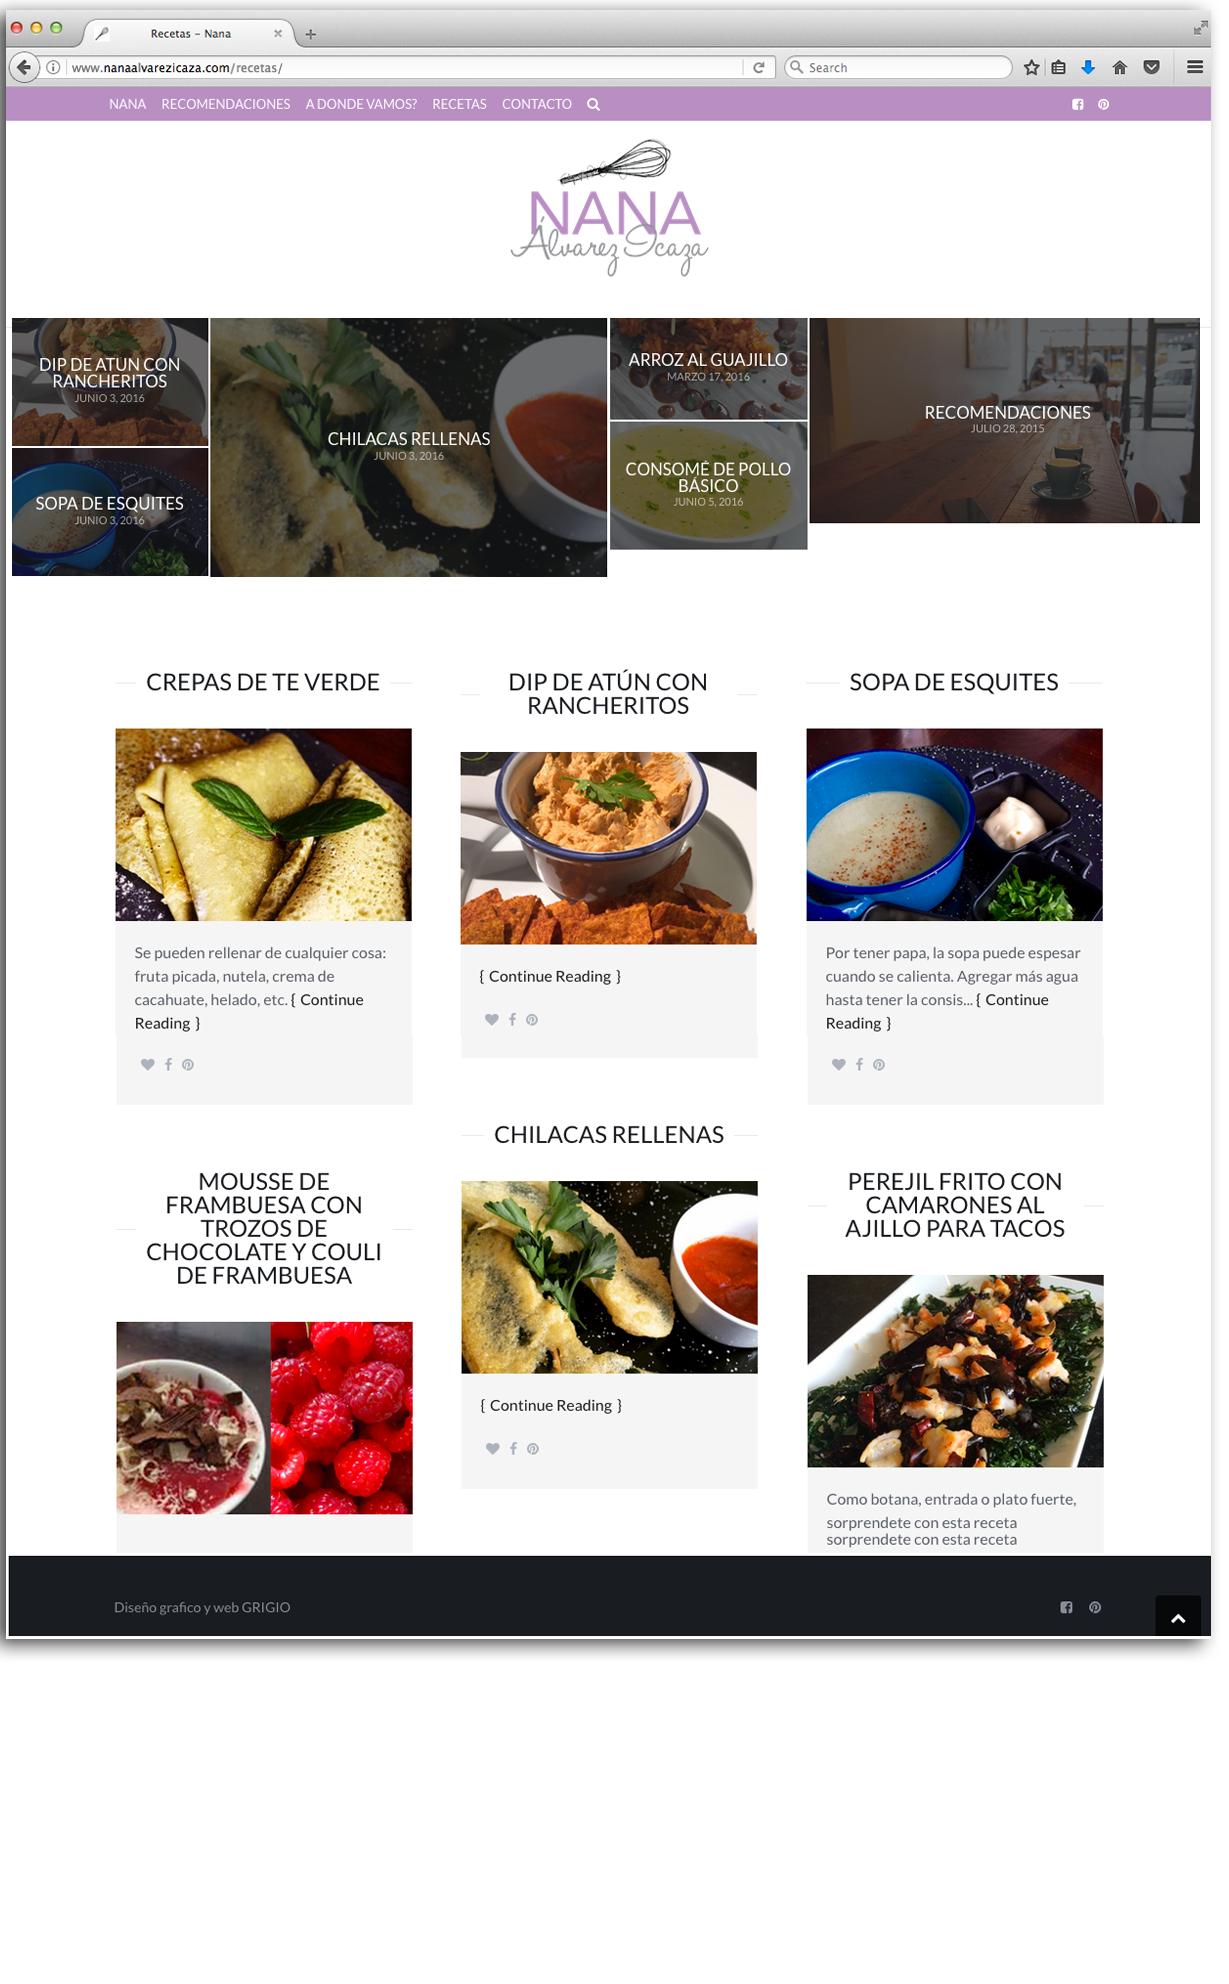 www.nanaalvarezicaza.com